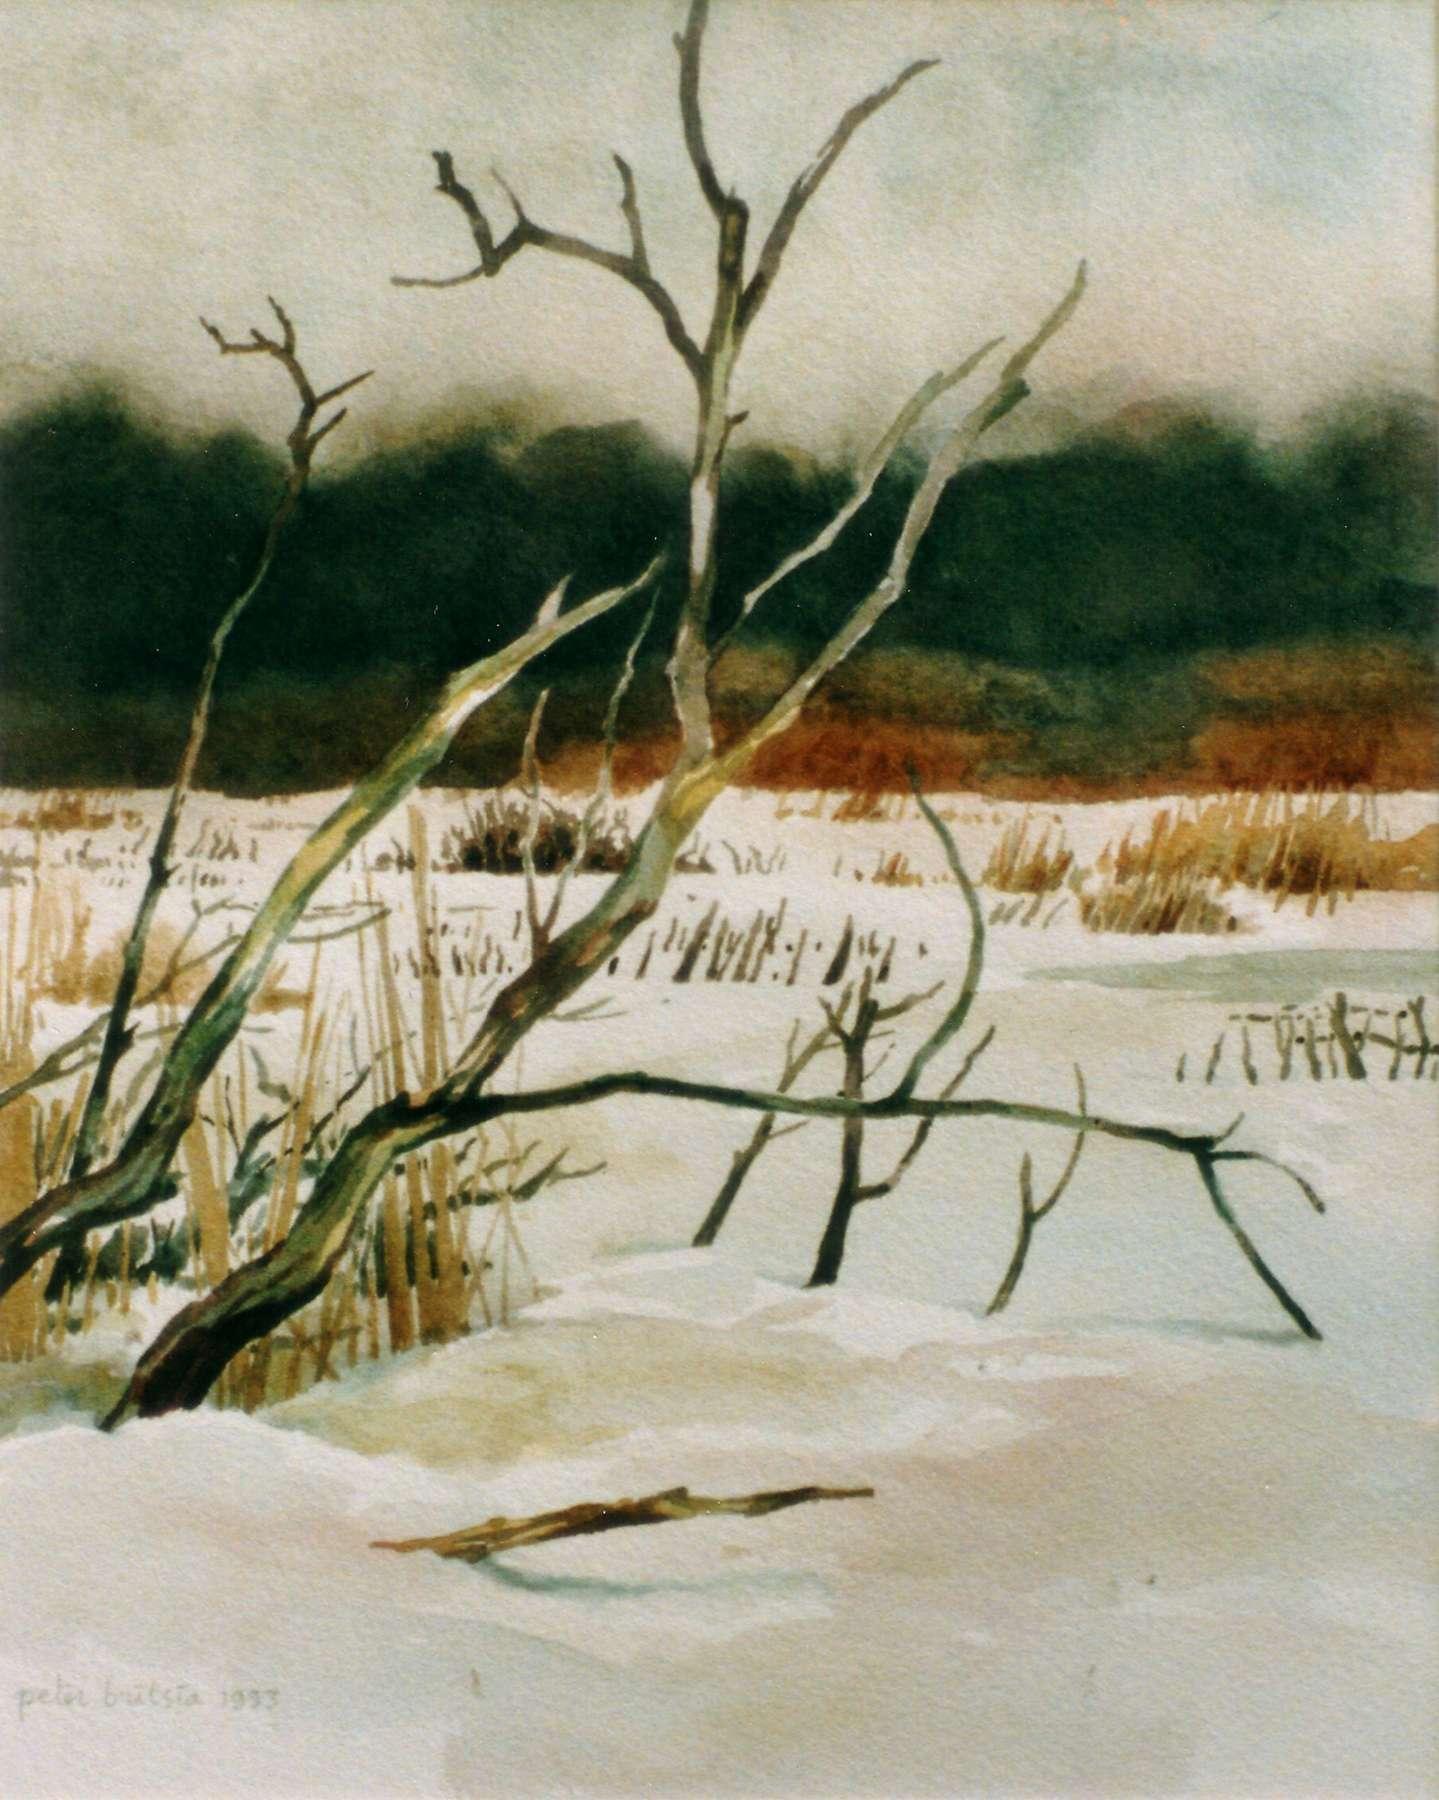 Quackjeswater 2- aquarel - 30 x 40 cm.